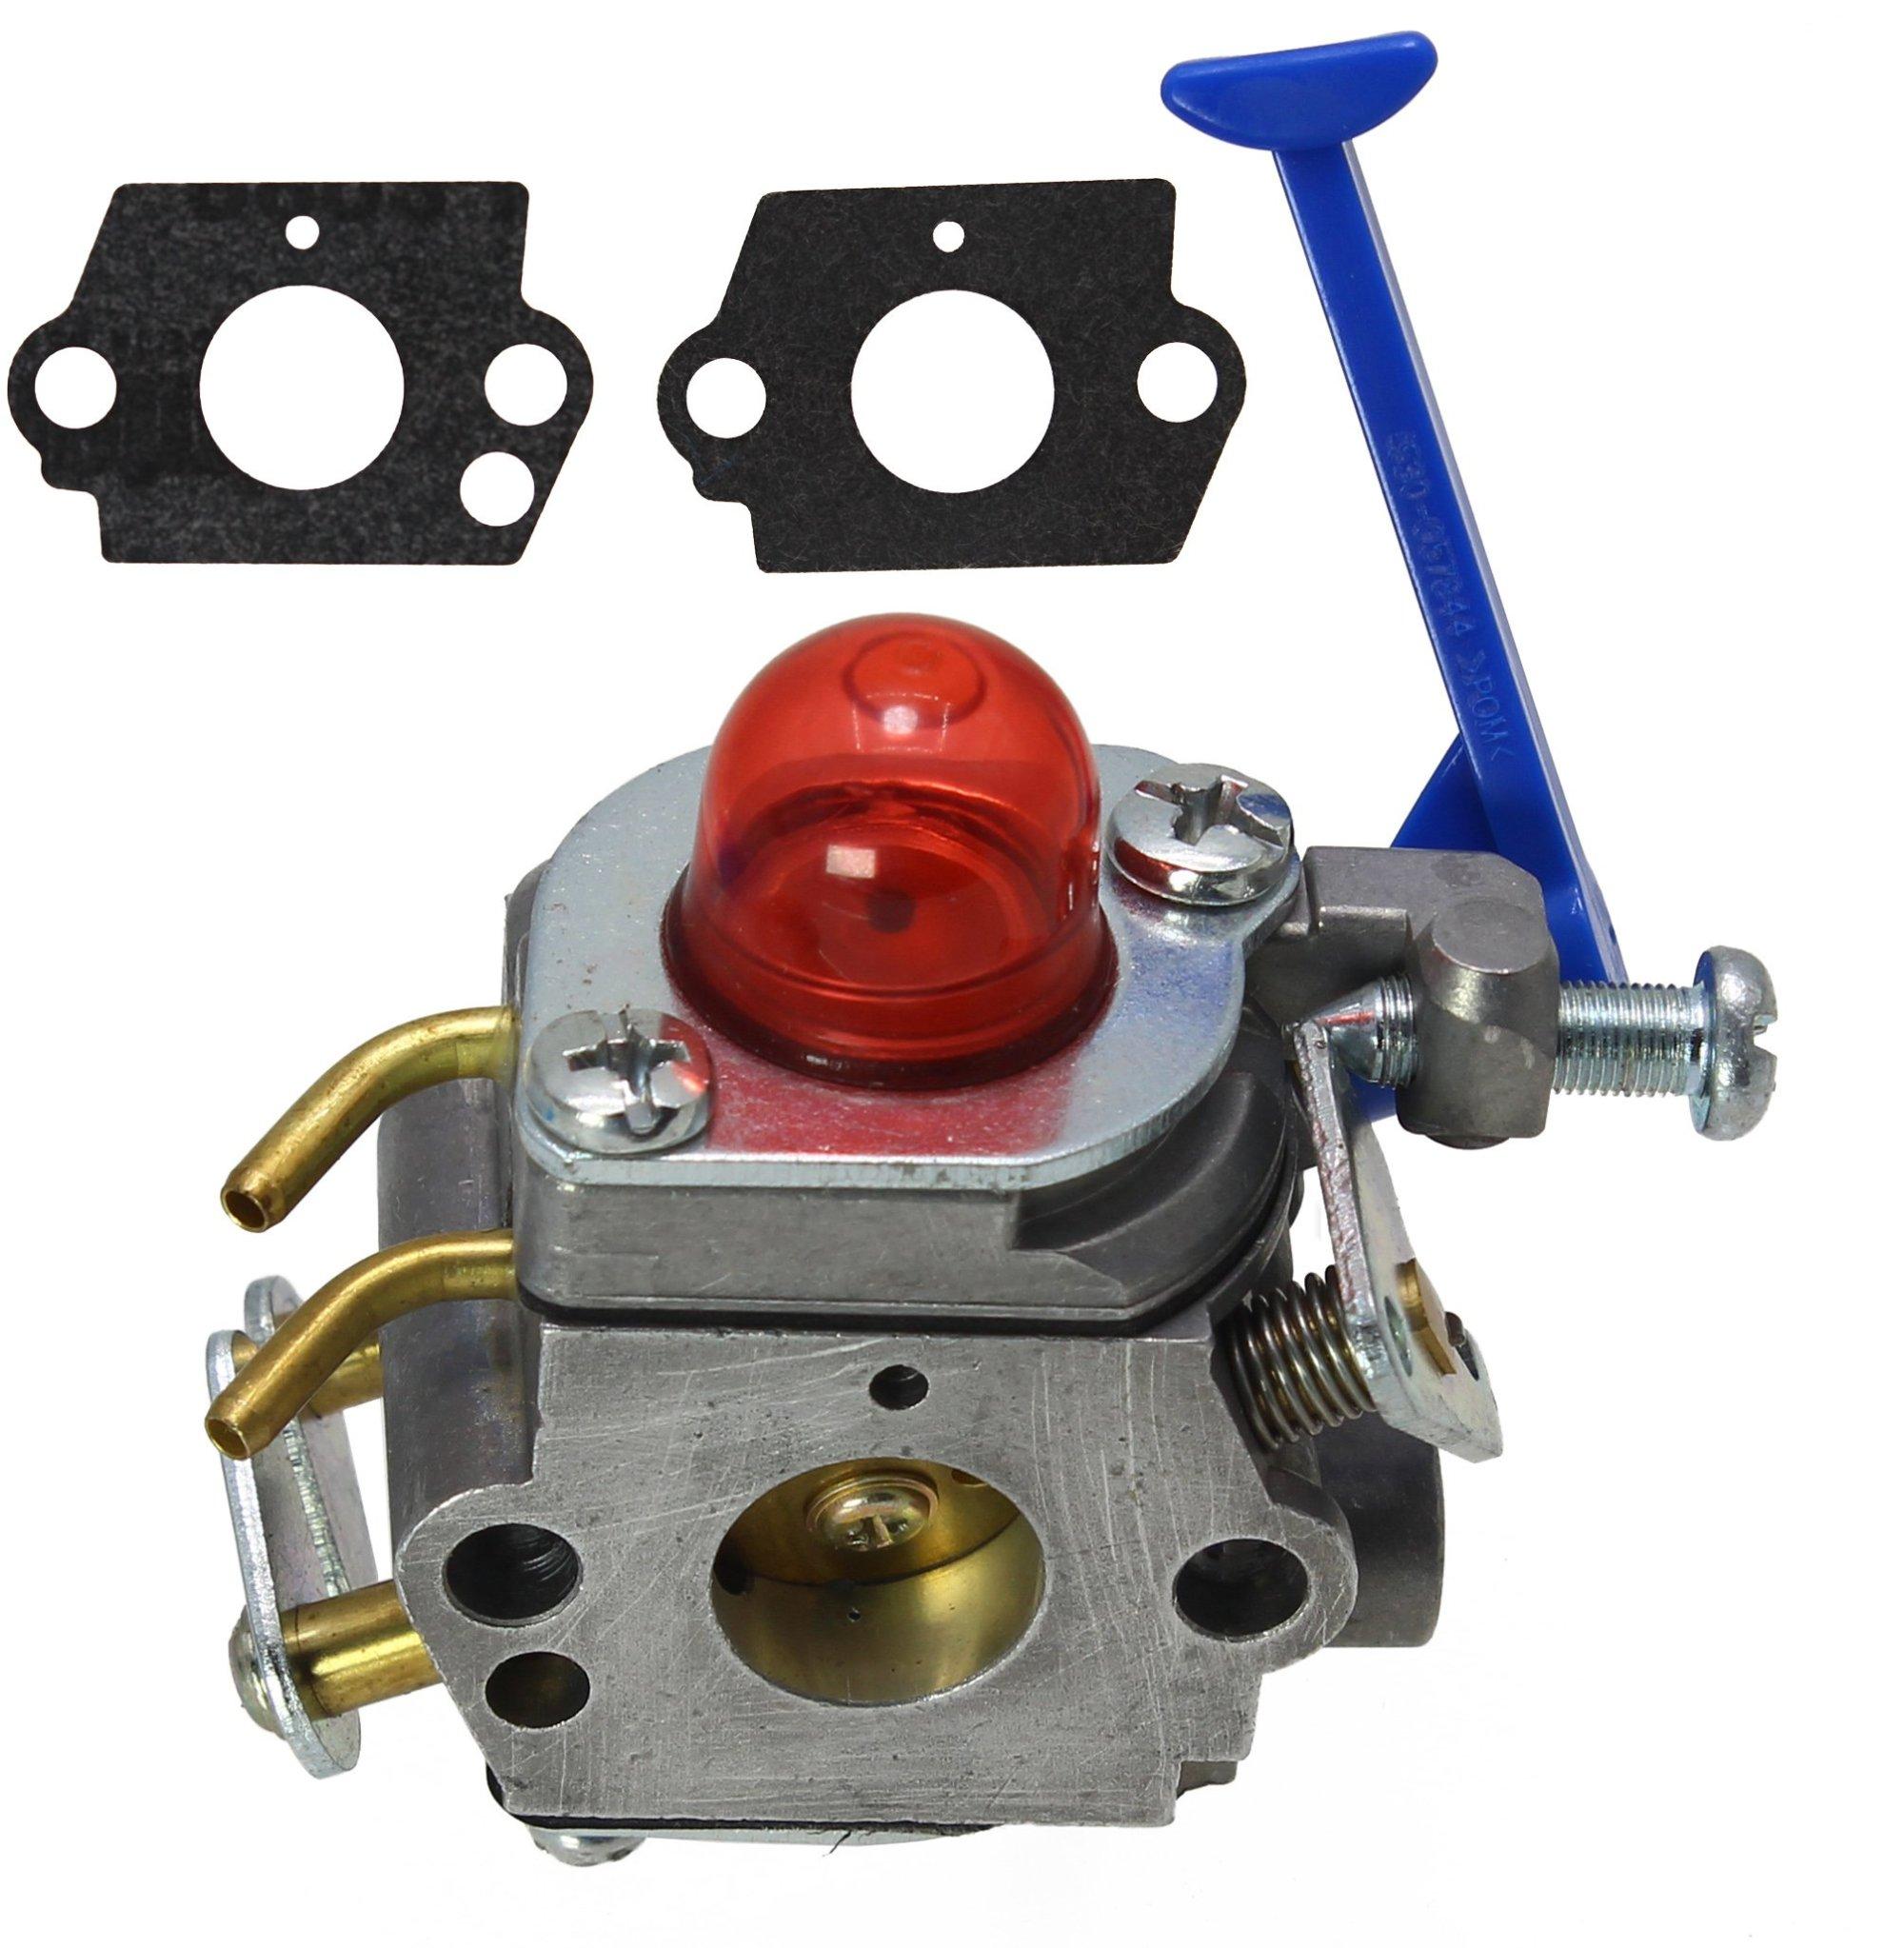 hight resolution of poulan husqvarna carburetor fits 128ld 125l 125ld 128c 128cd 128l 128r 128rj 128ldx 128djx 124l 545081848